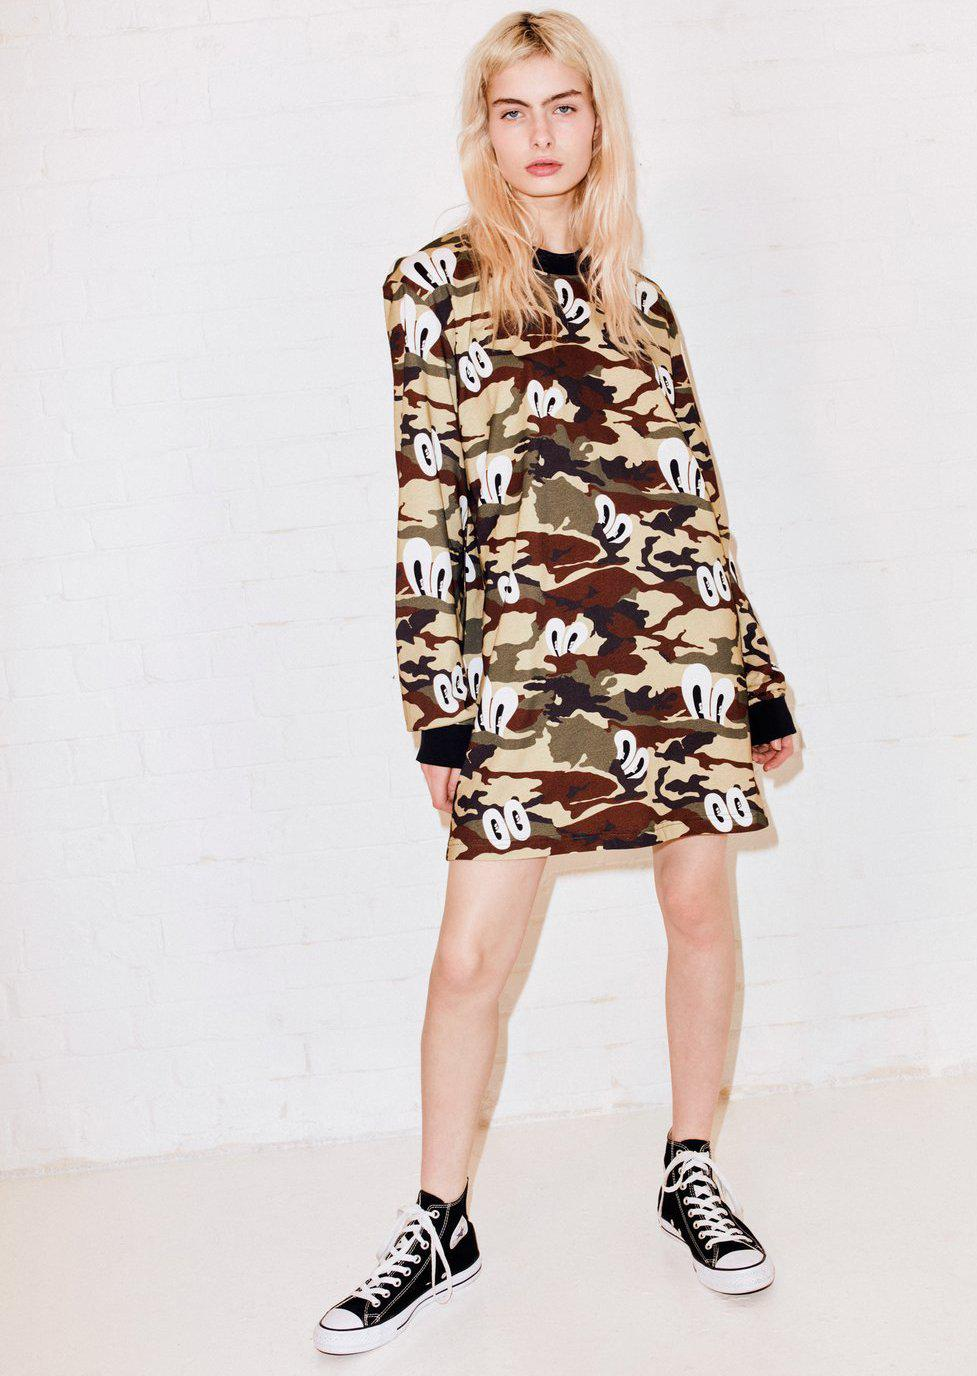 512dc0a52d2c3 House of Holland Camo Print Oversized T-shirt Dress - Lyst